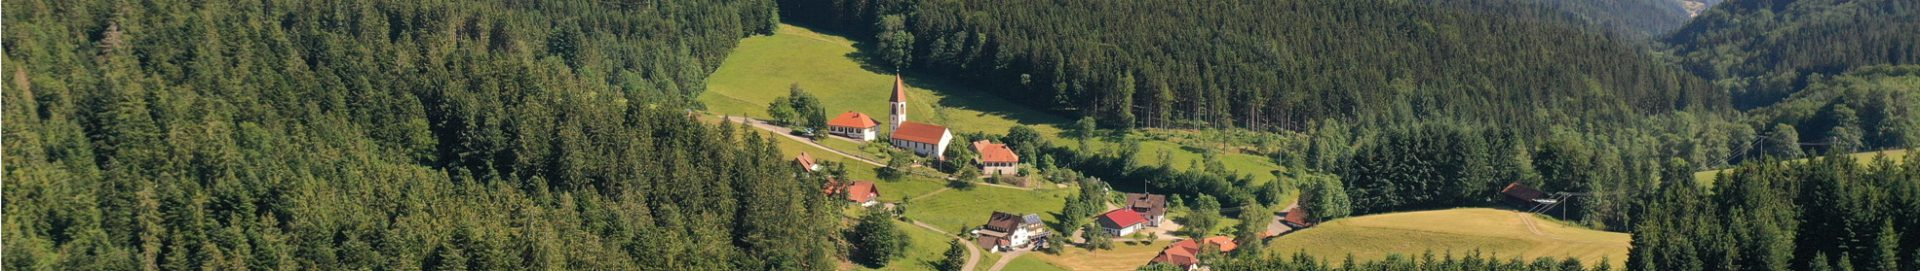 Klausenhansenhof